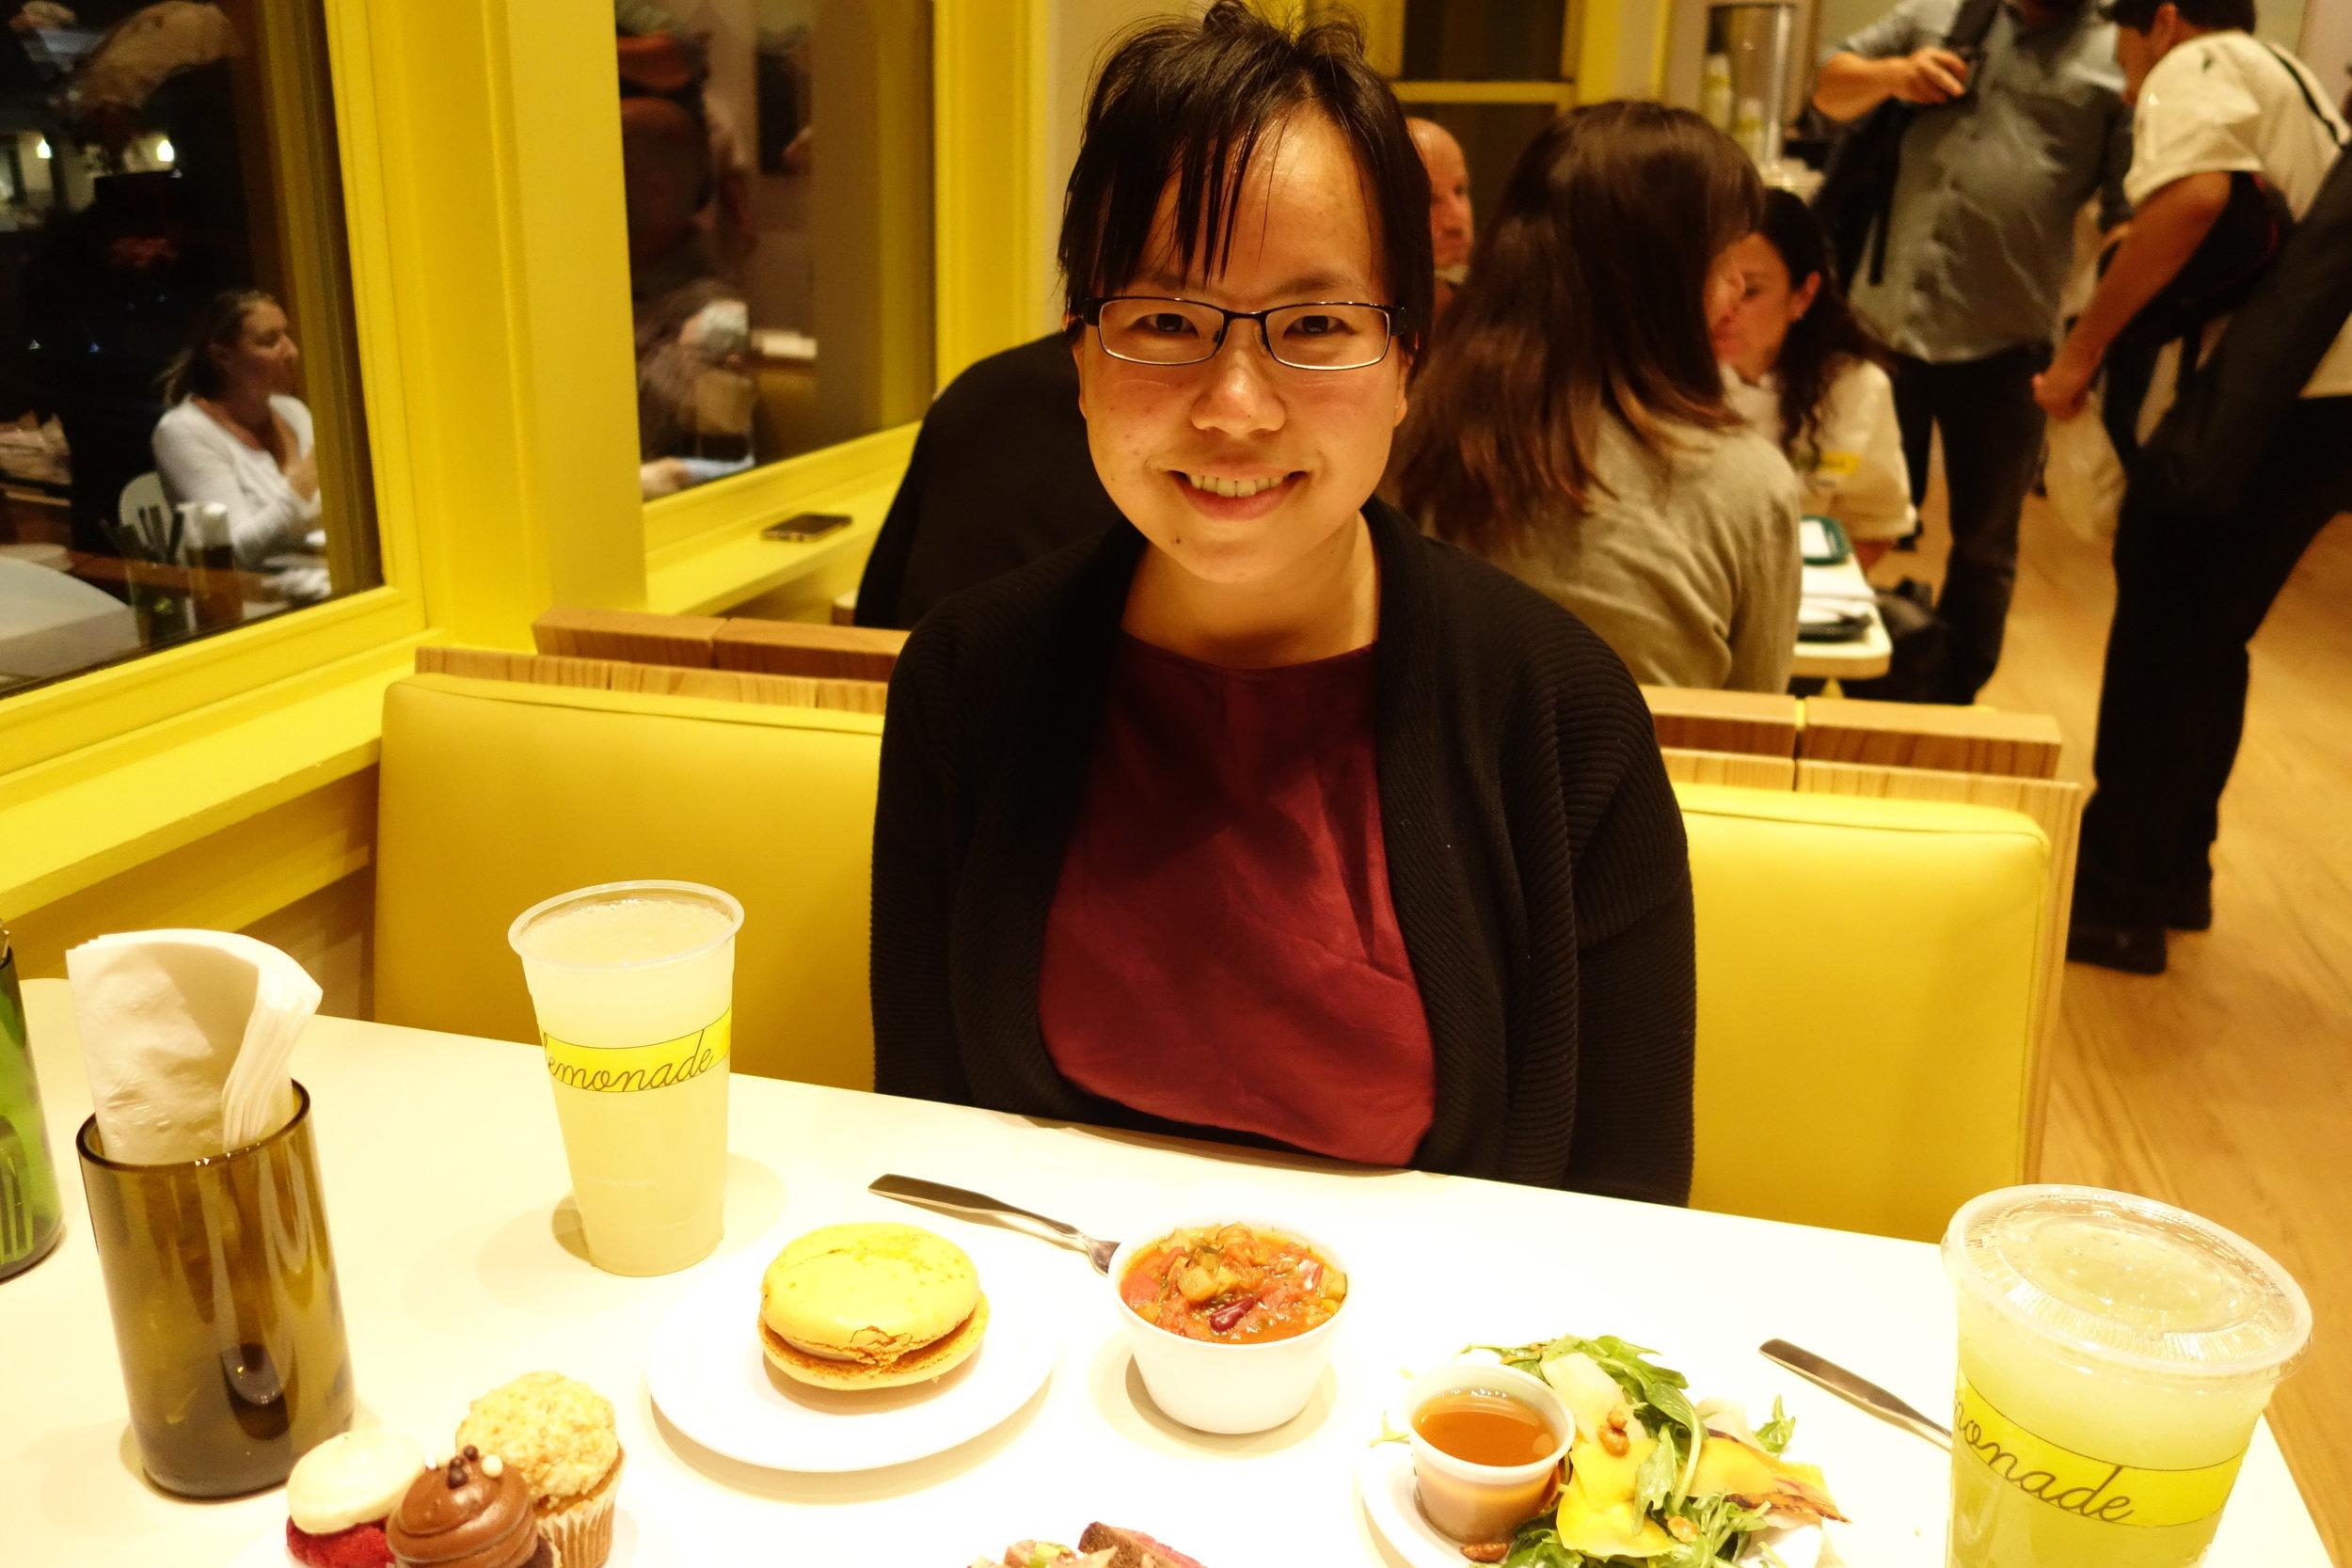 Sandy Leung, SF Food Photographer & Blogger for SandyByTheBay.com